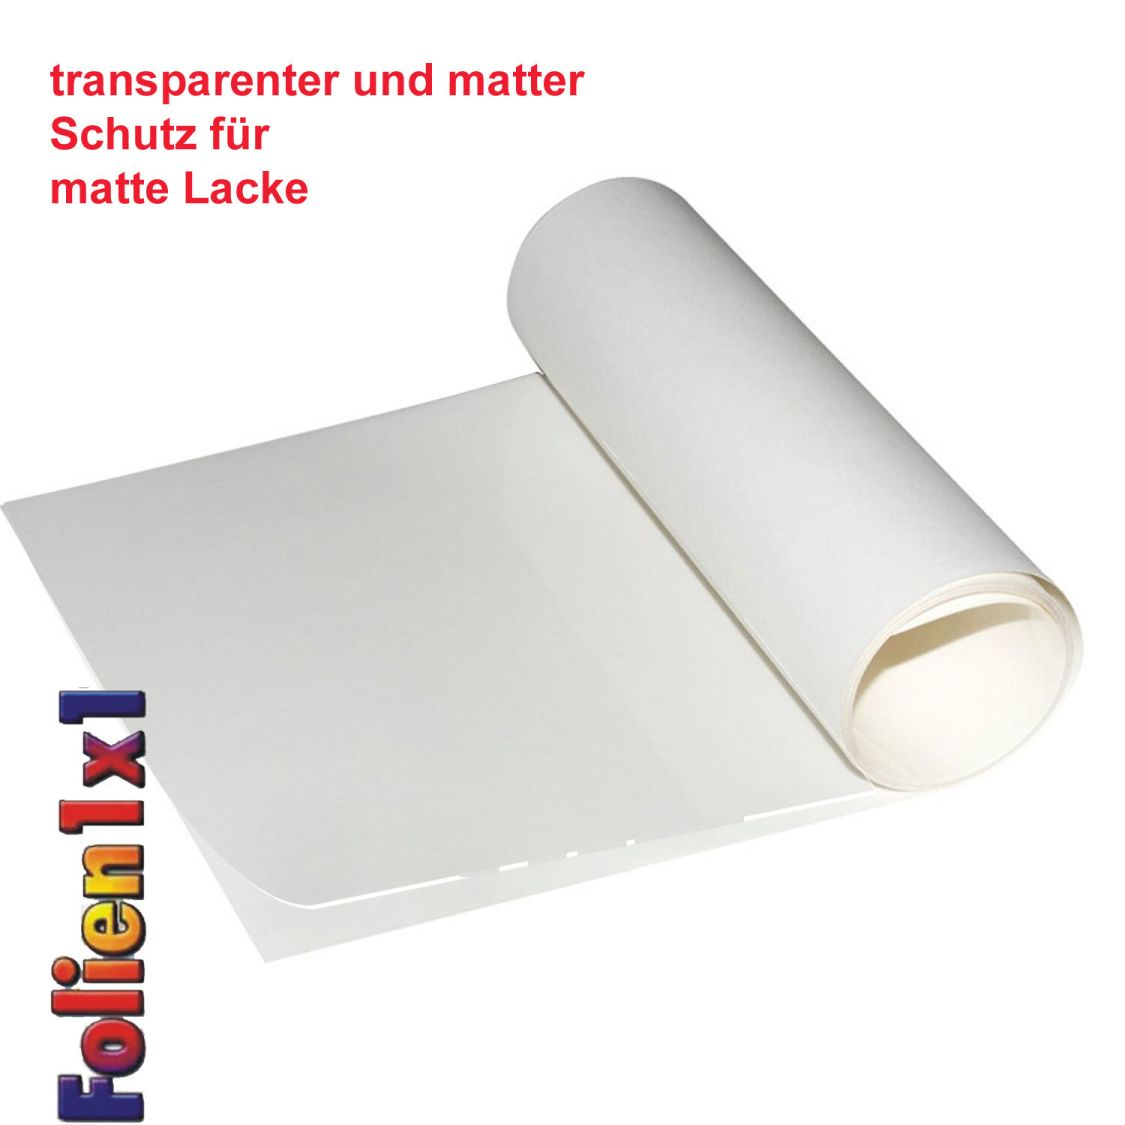 matt transparente Lackschutzfolie Xpel Stealth 100cm x 12cm x0,16mm matte Lacke